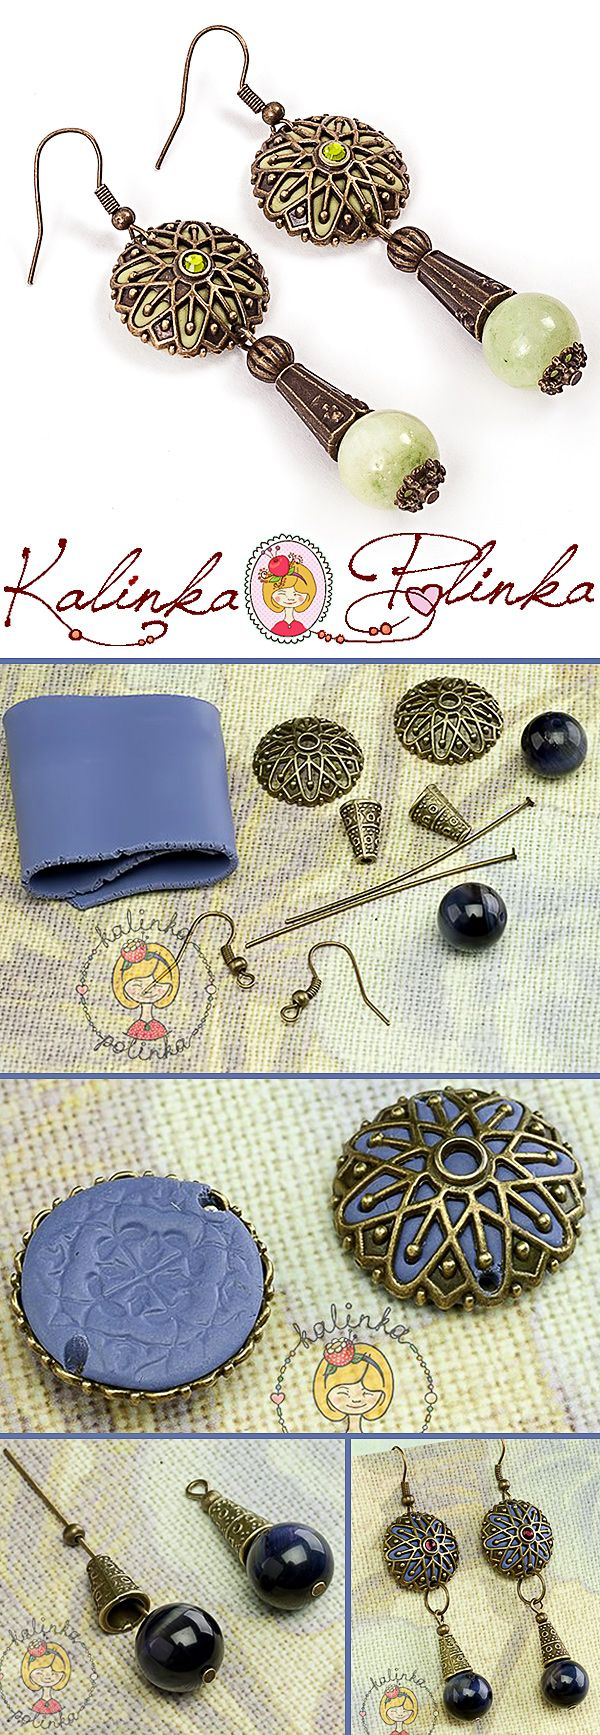 Серьги с использованием полимерной глины урок, мастер-класс How to make earrings with polymer clay. Tutorial, DYI